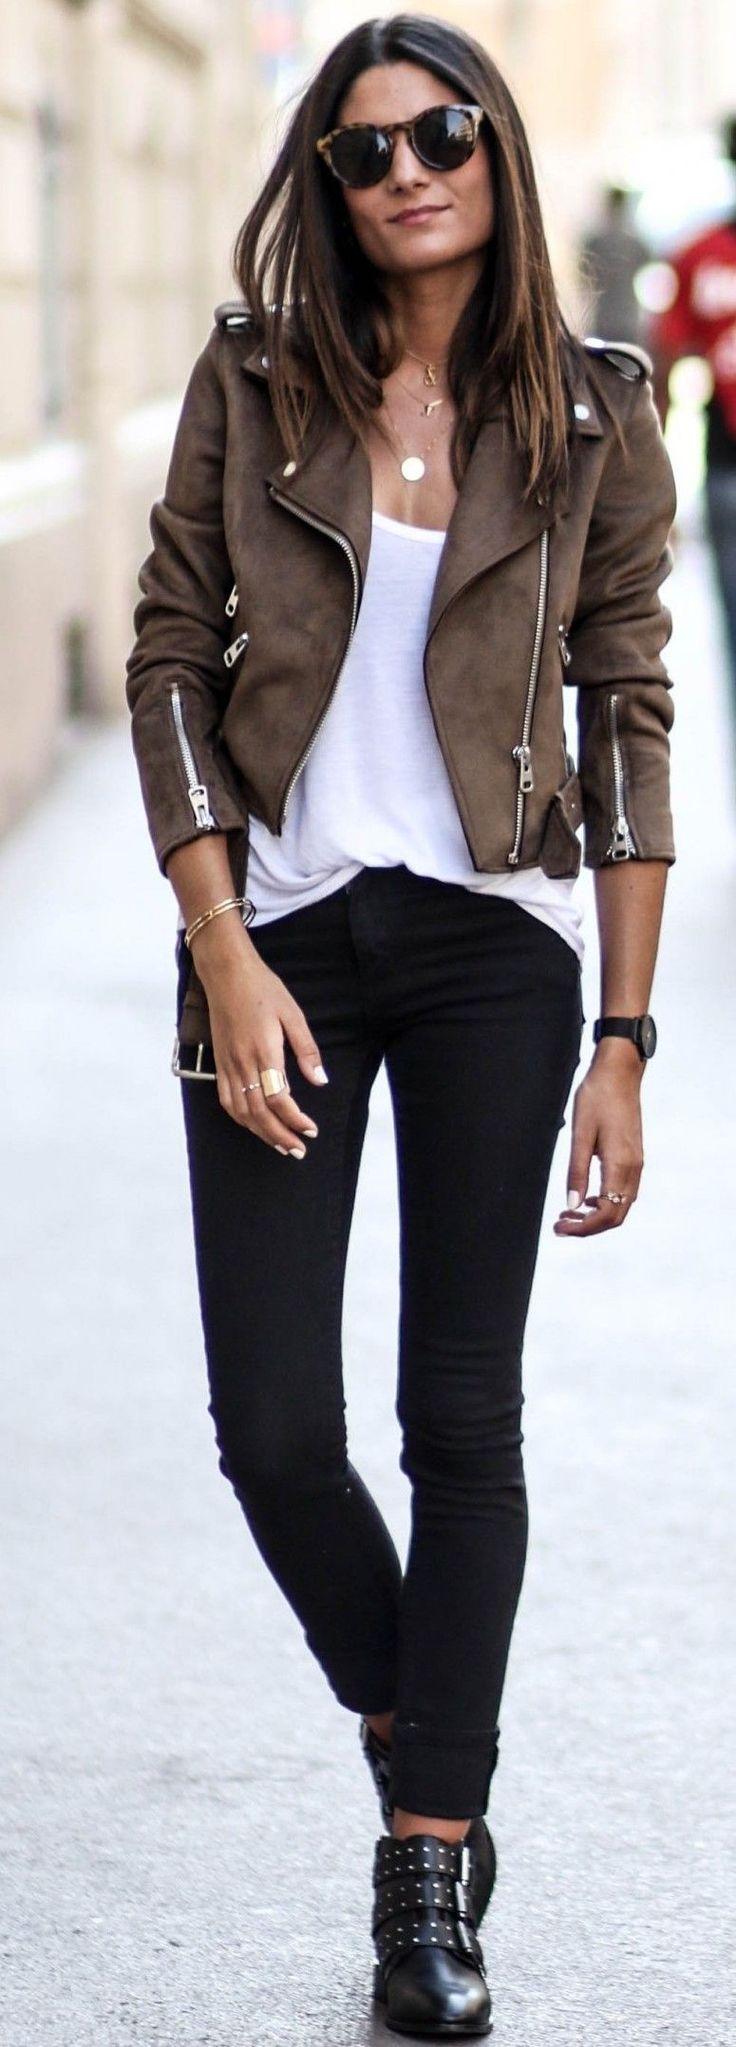 #fall #street #style |  Suede Chaqueta de motorista + blanco Tee + pantalones vaqueros negros